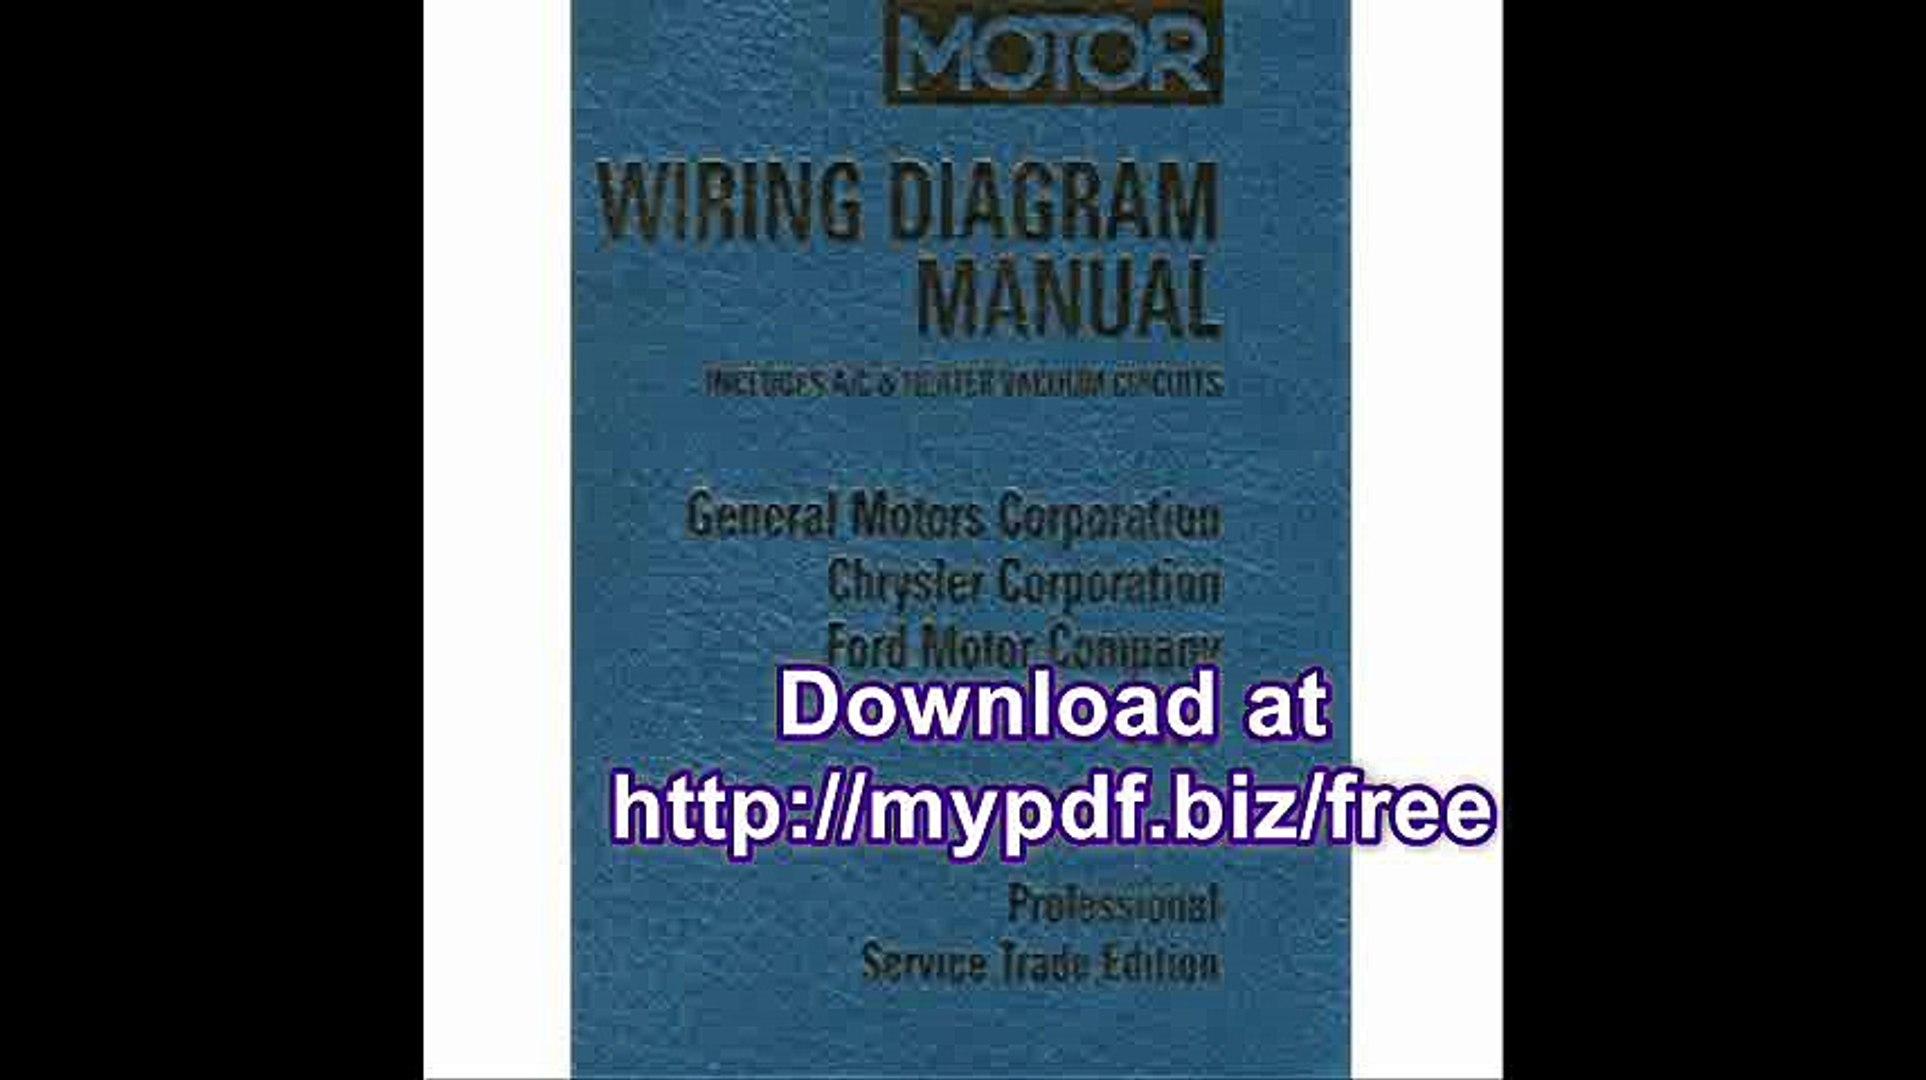 Ford Motor Wiring Diagram